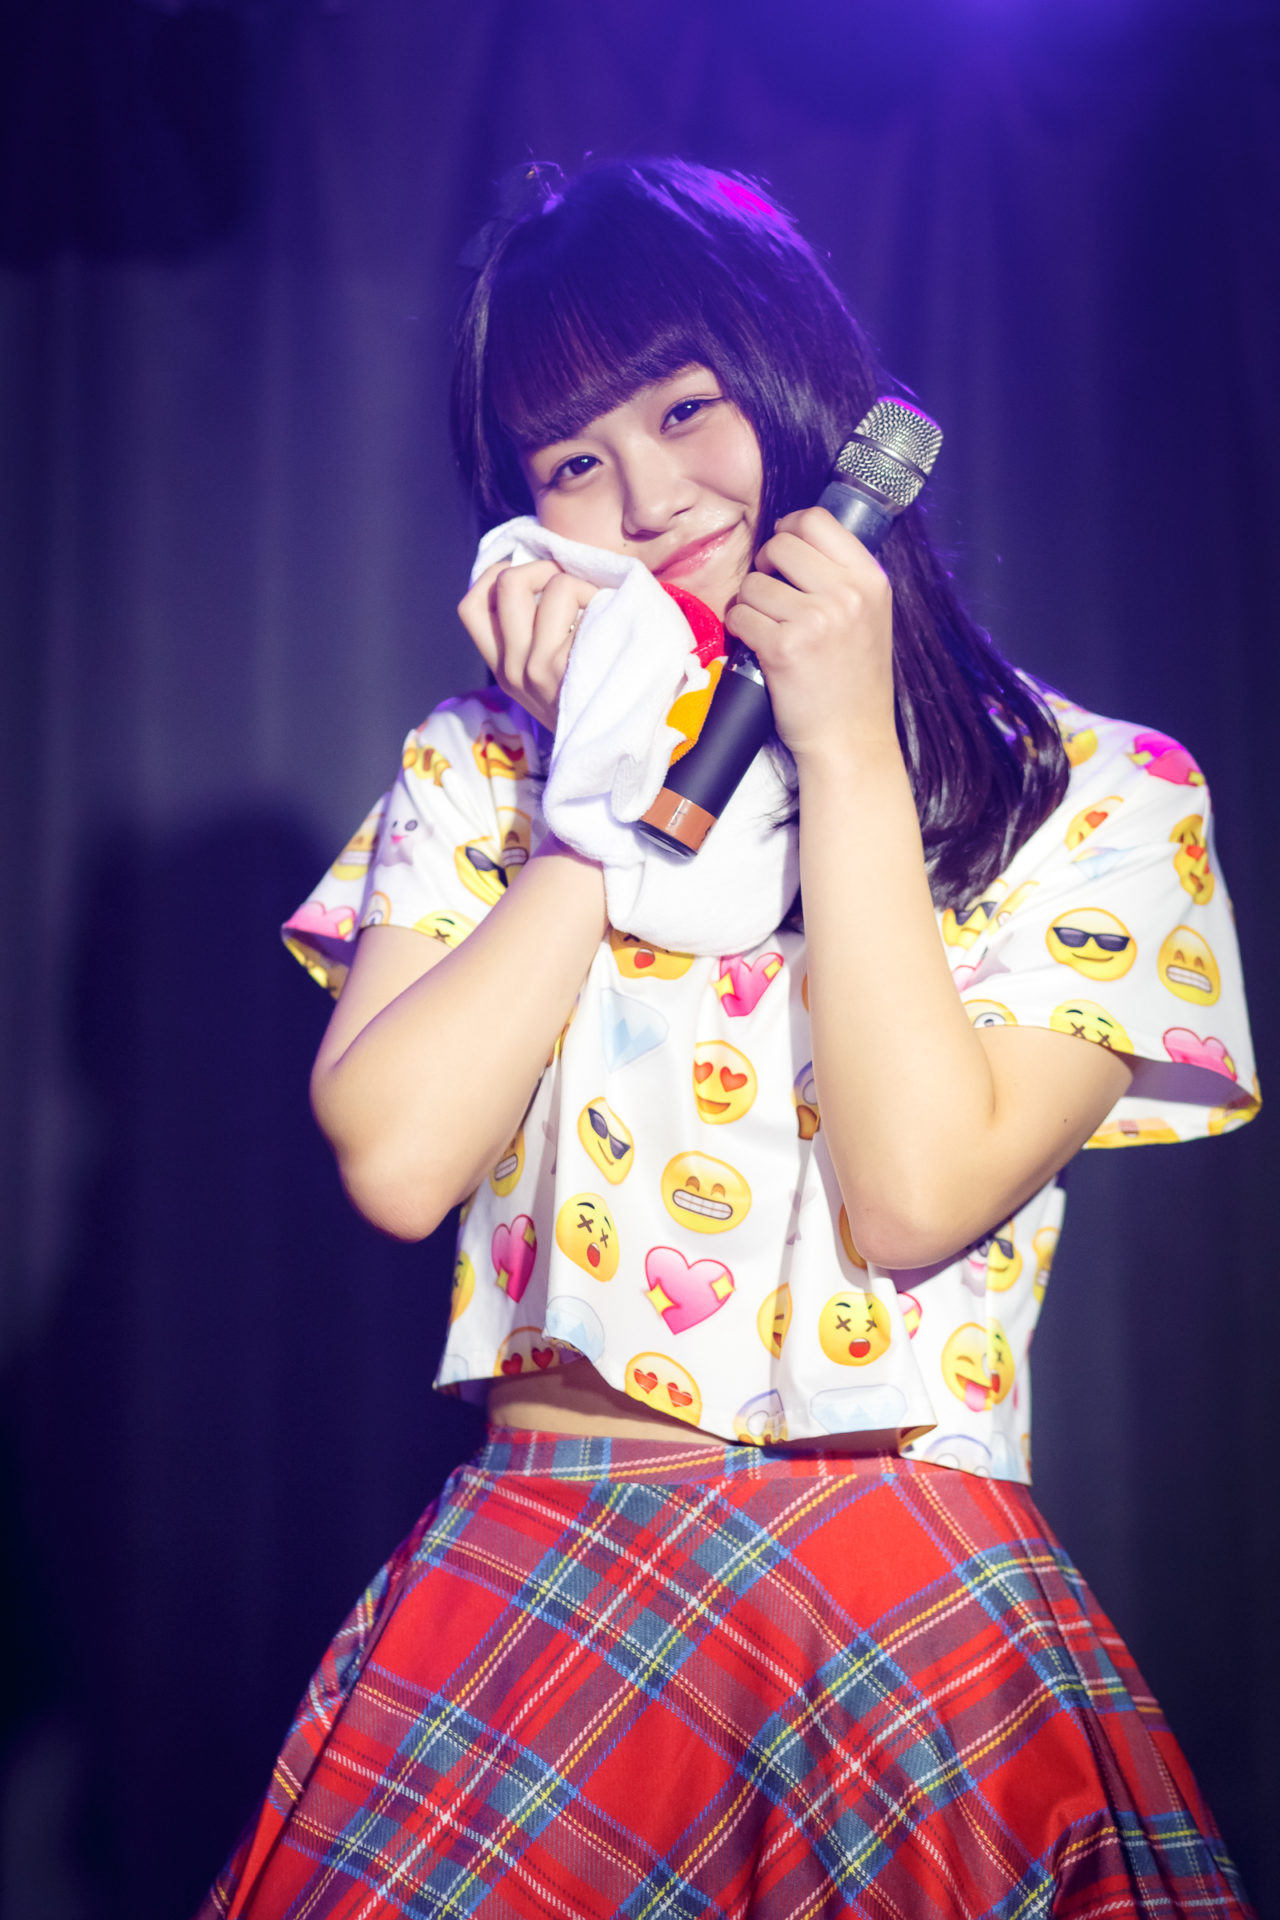 POPPING☆SMILE あいり ( 永山愛梨 ) | 苗の木LIVE Vol.27 ~お賽銭LIVE 春の陣~